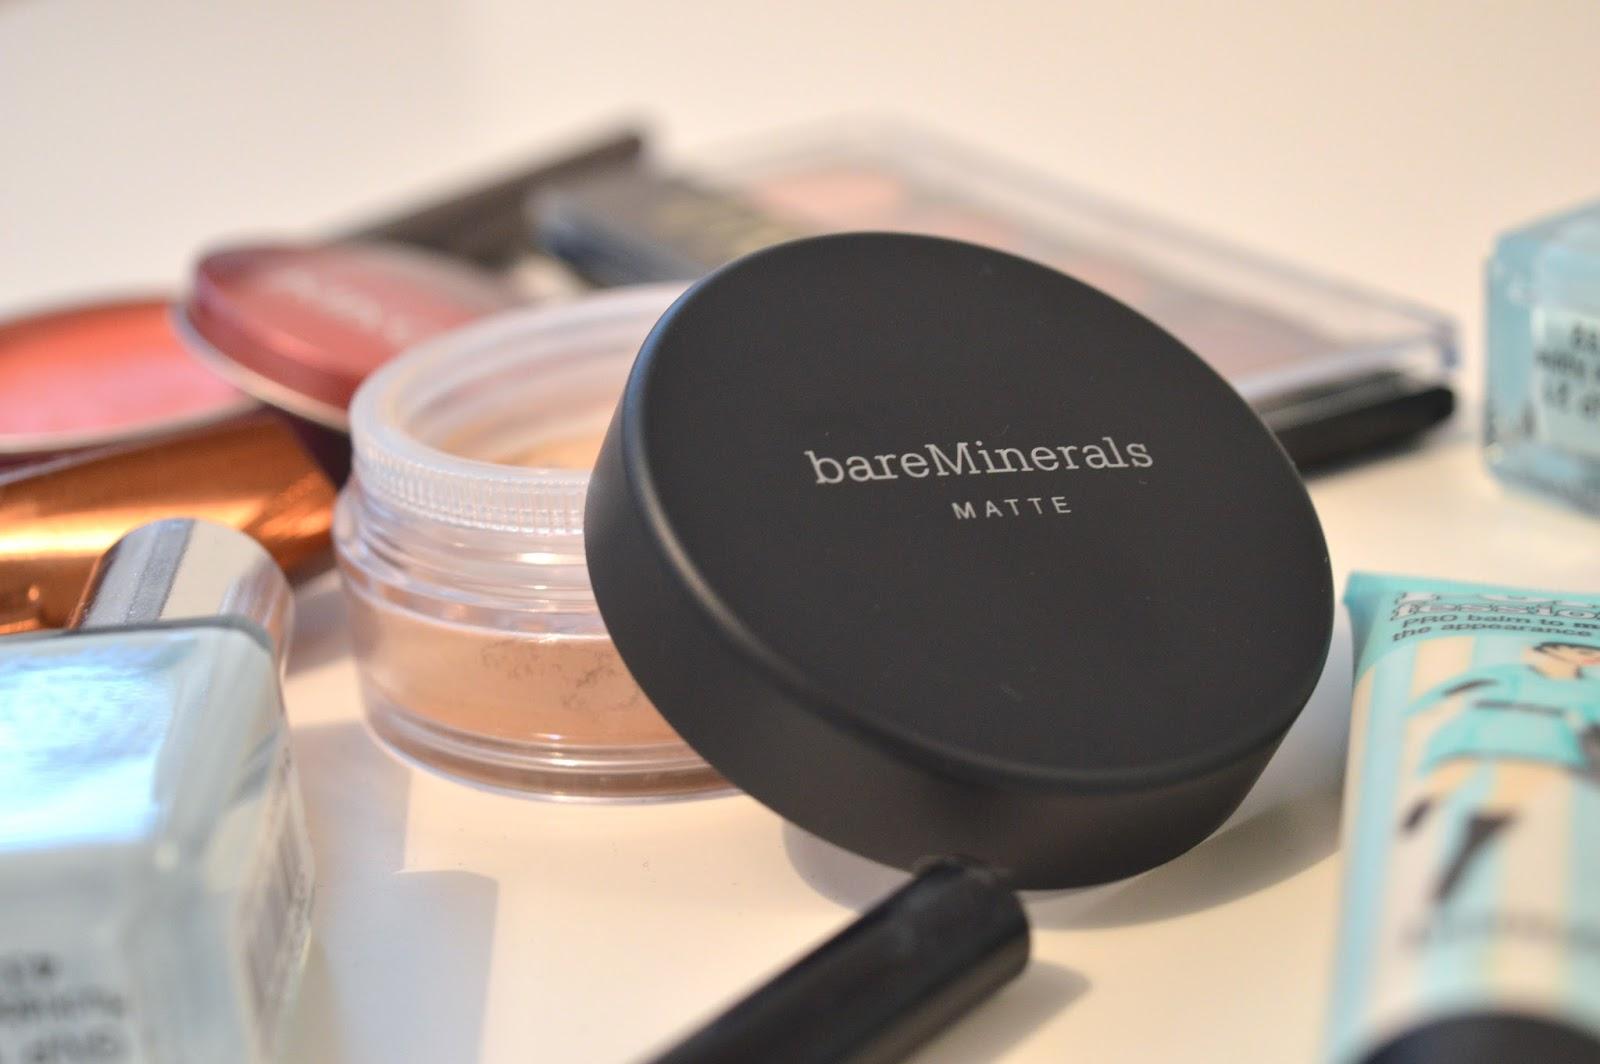 bareMinerals Matte Fairly Light Powder Foundation